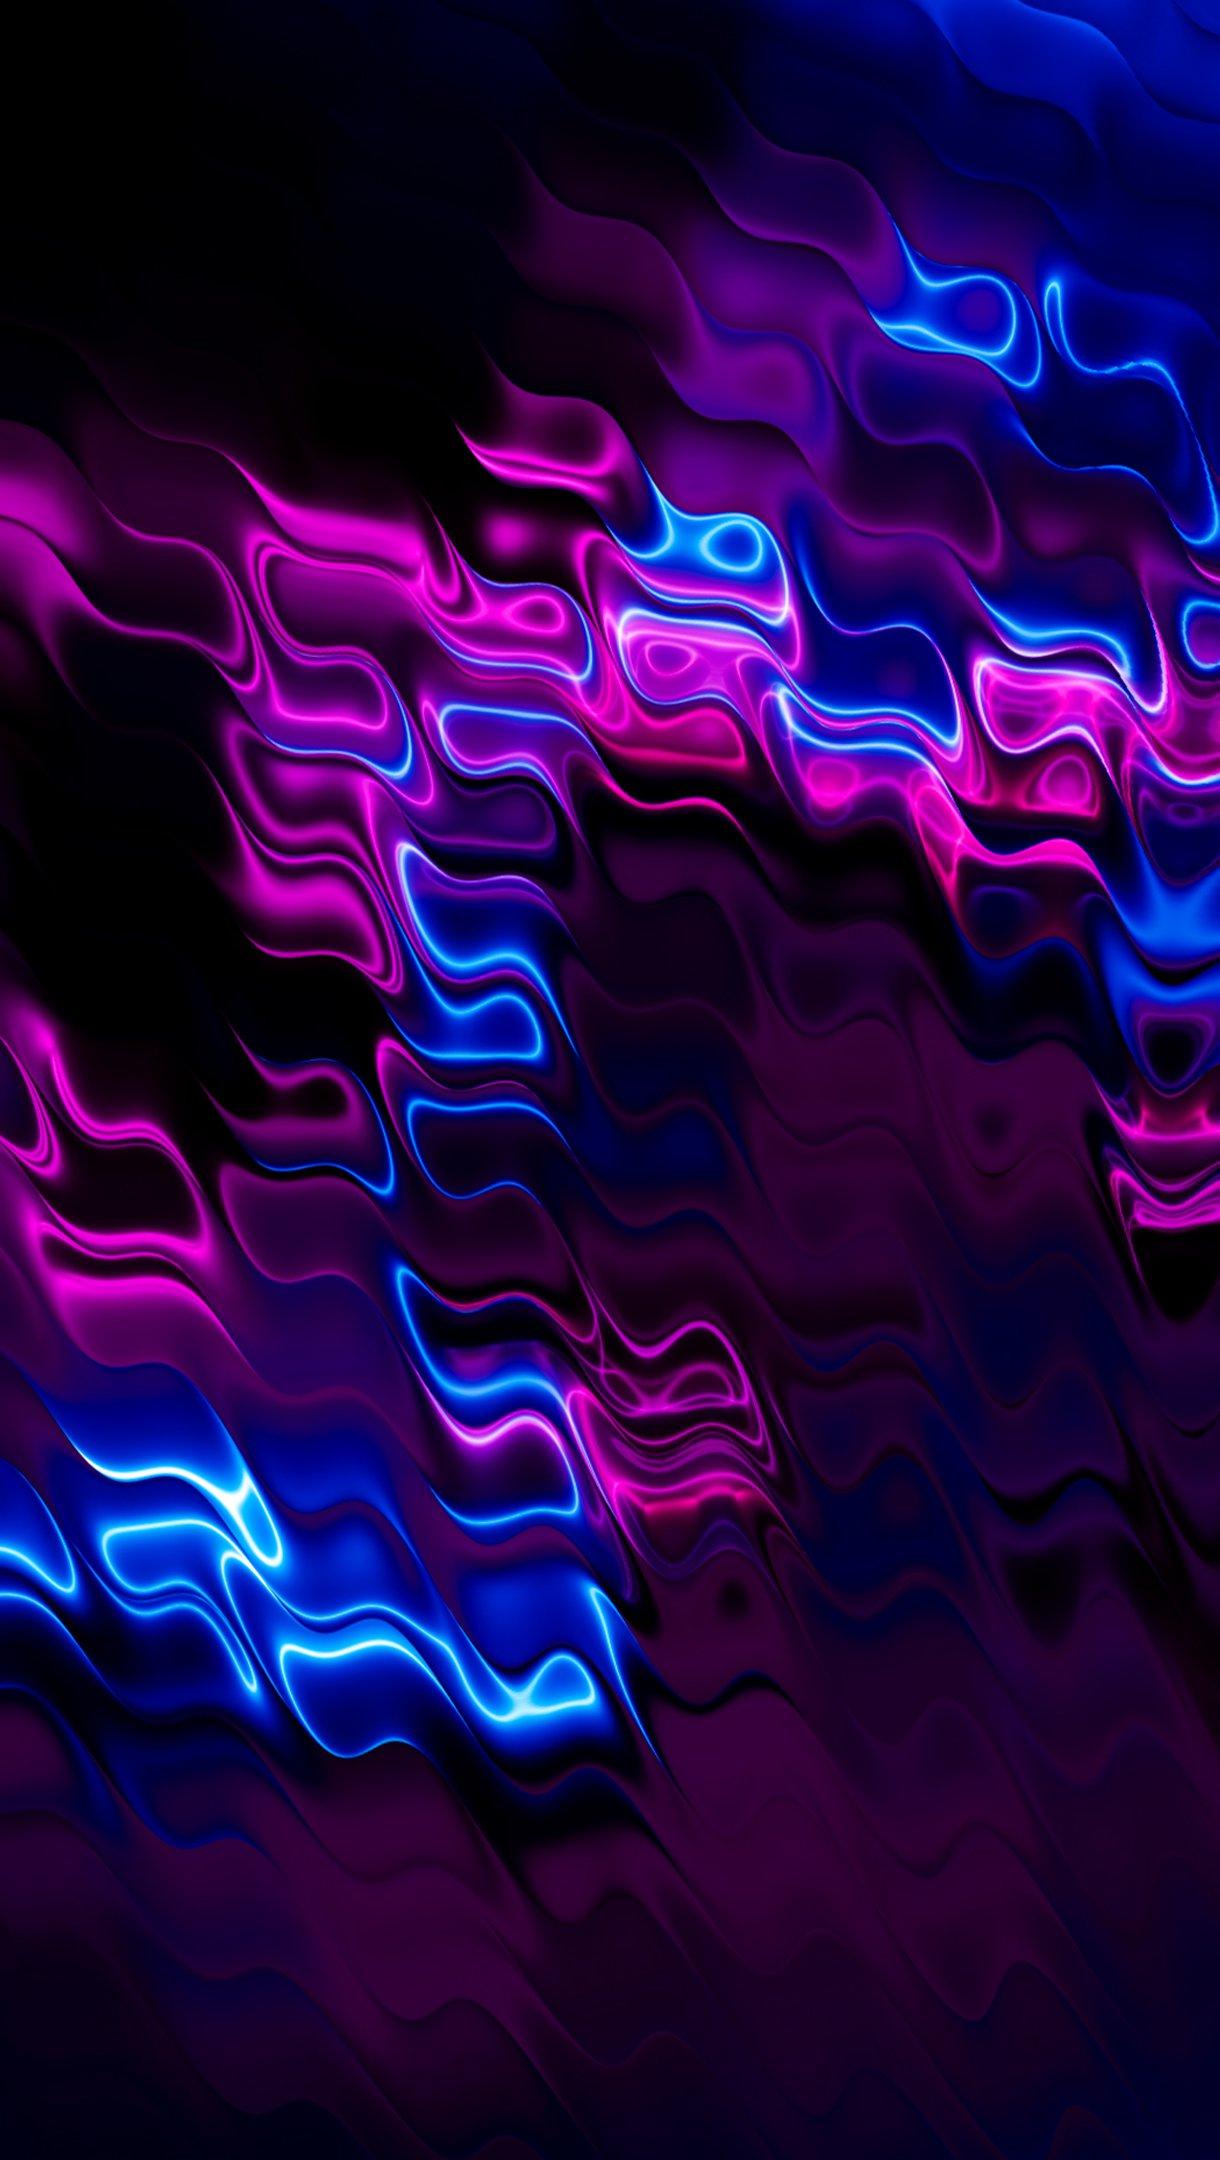 Fondos de pantalla Celdas moradas y azules Vertical